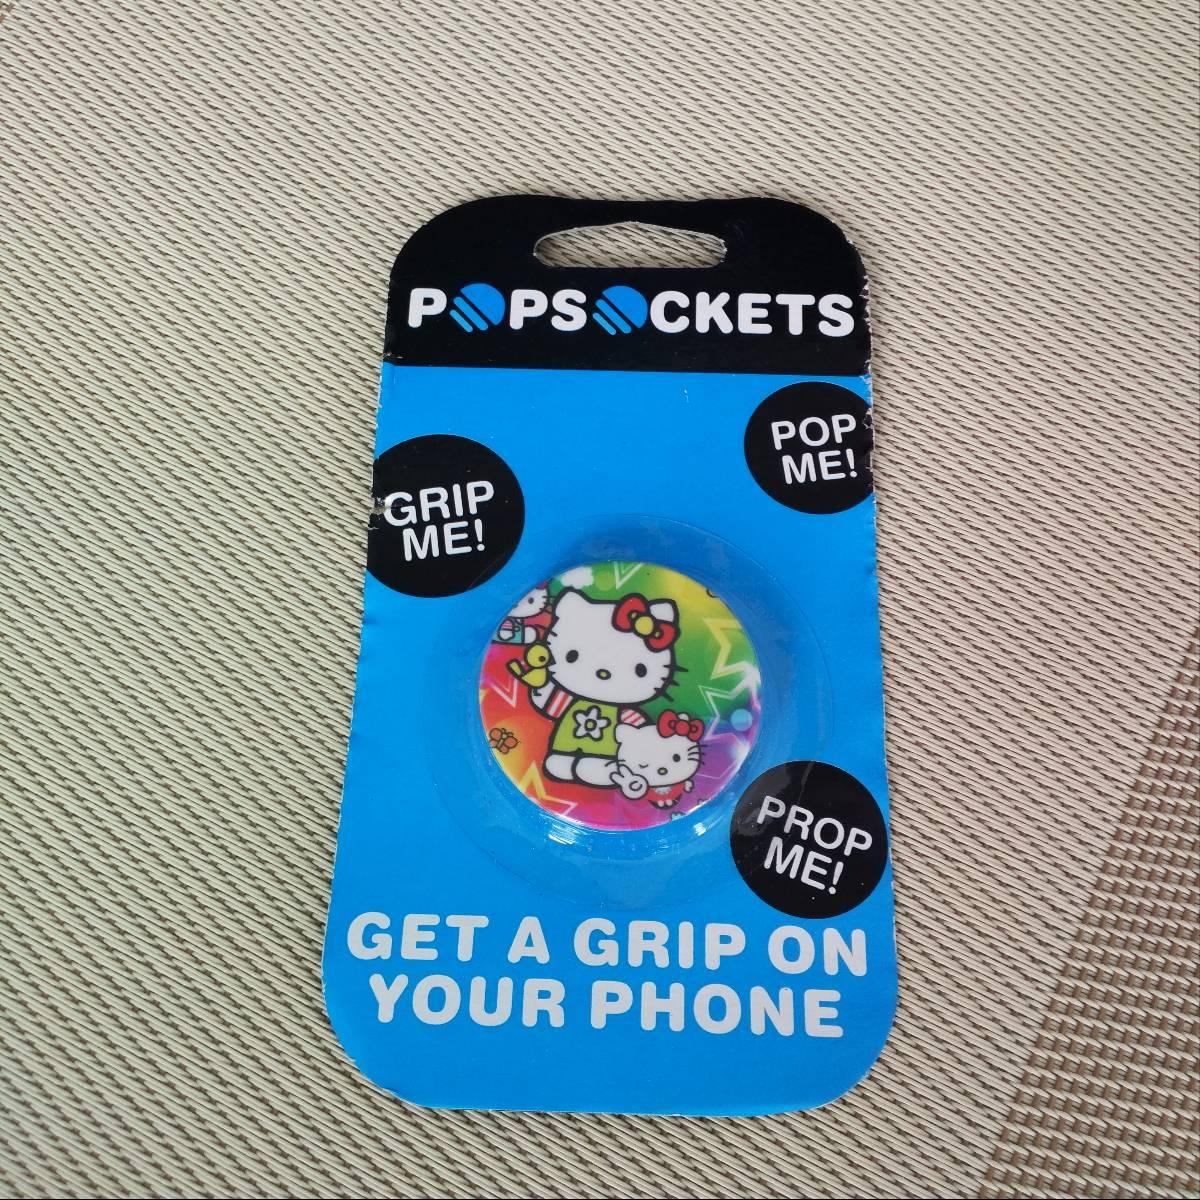 Pop Socket Phone Holder Iring Banyak Motif4